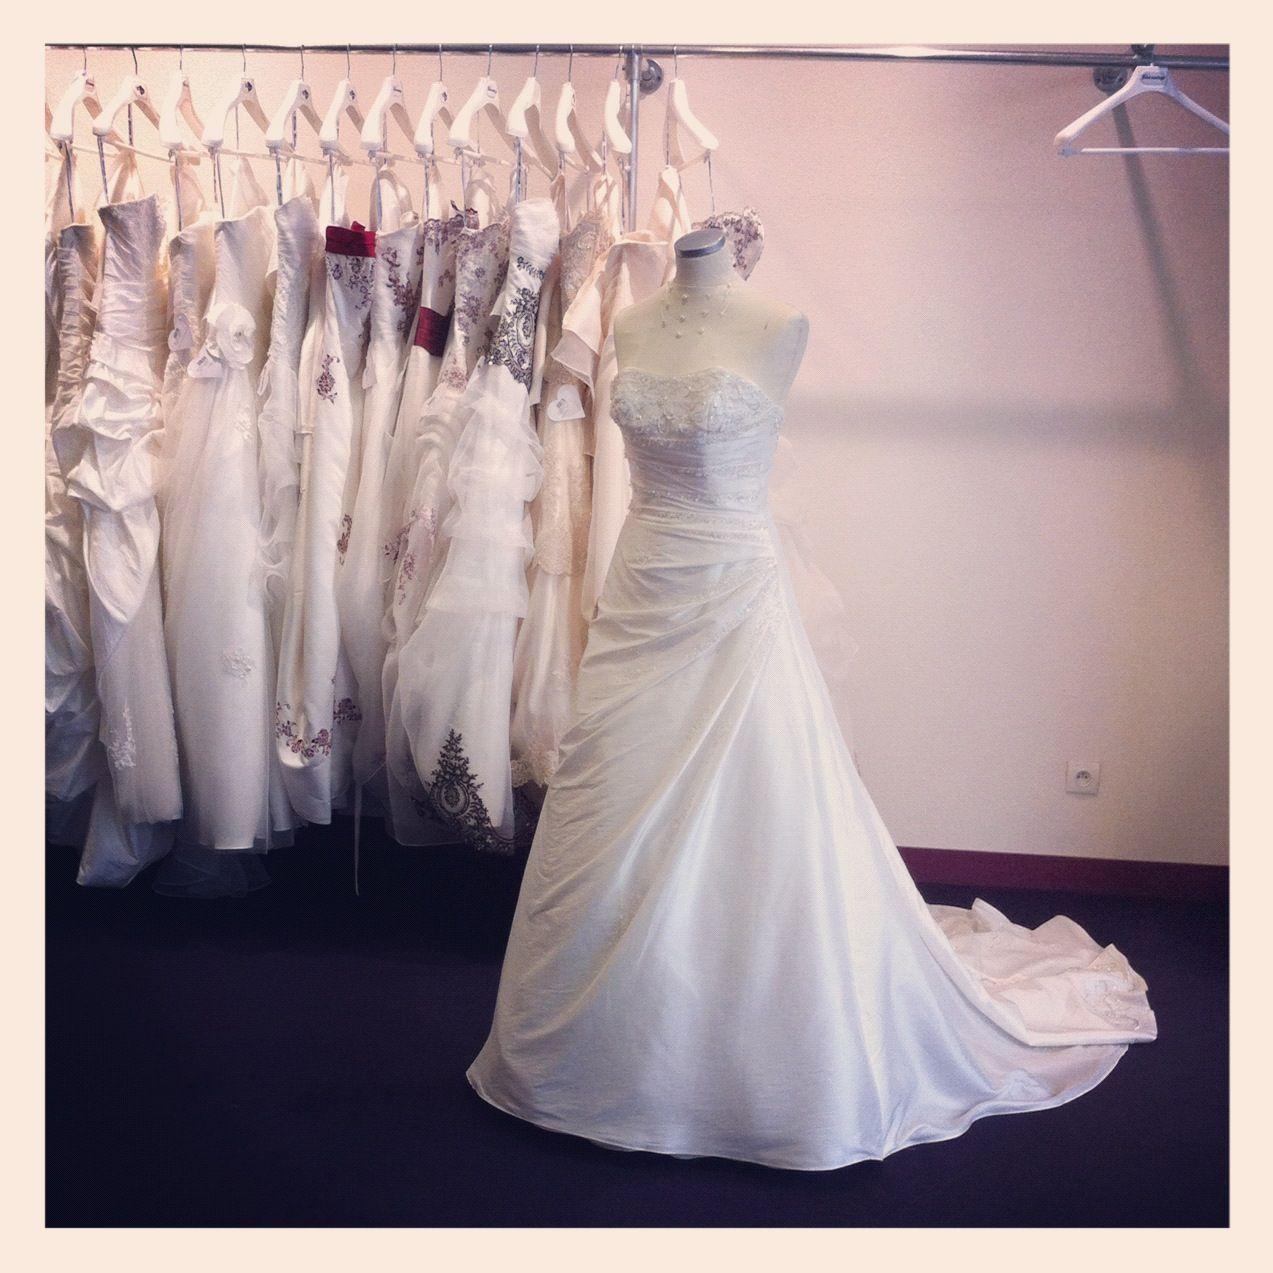 Magasin de robe de mariee clermont ferrand